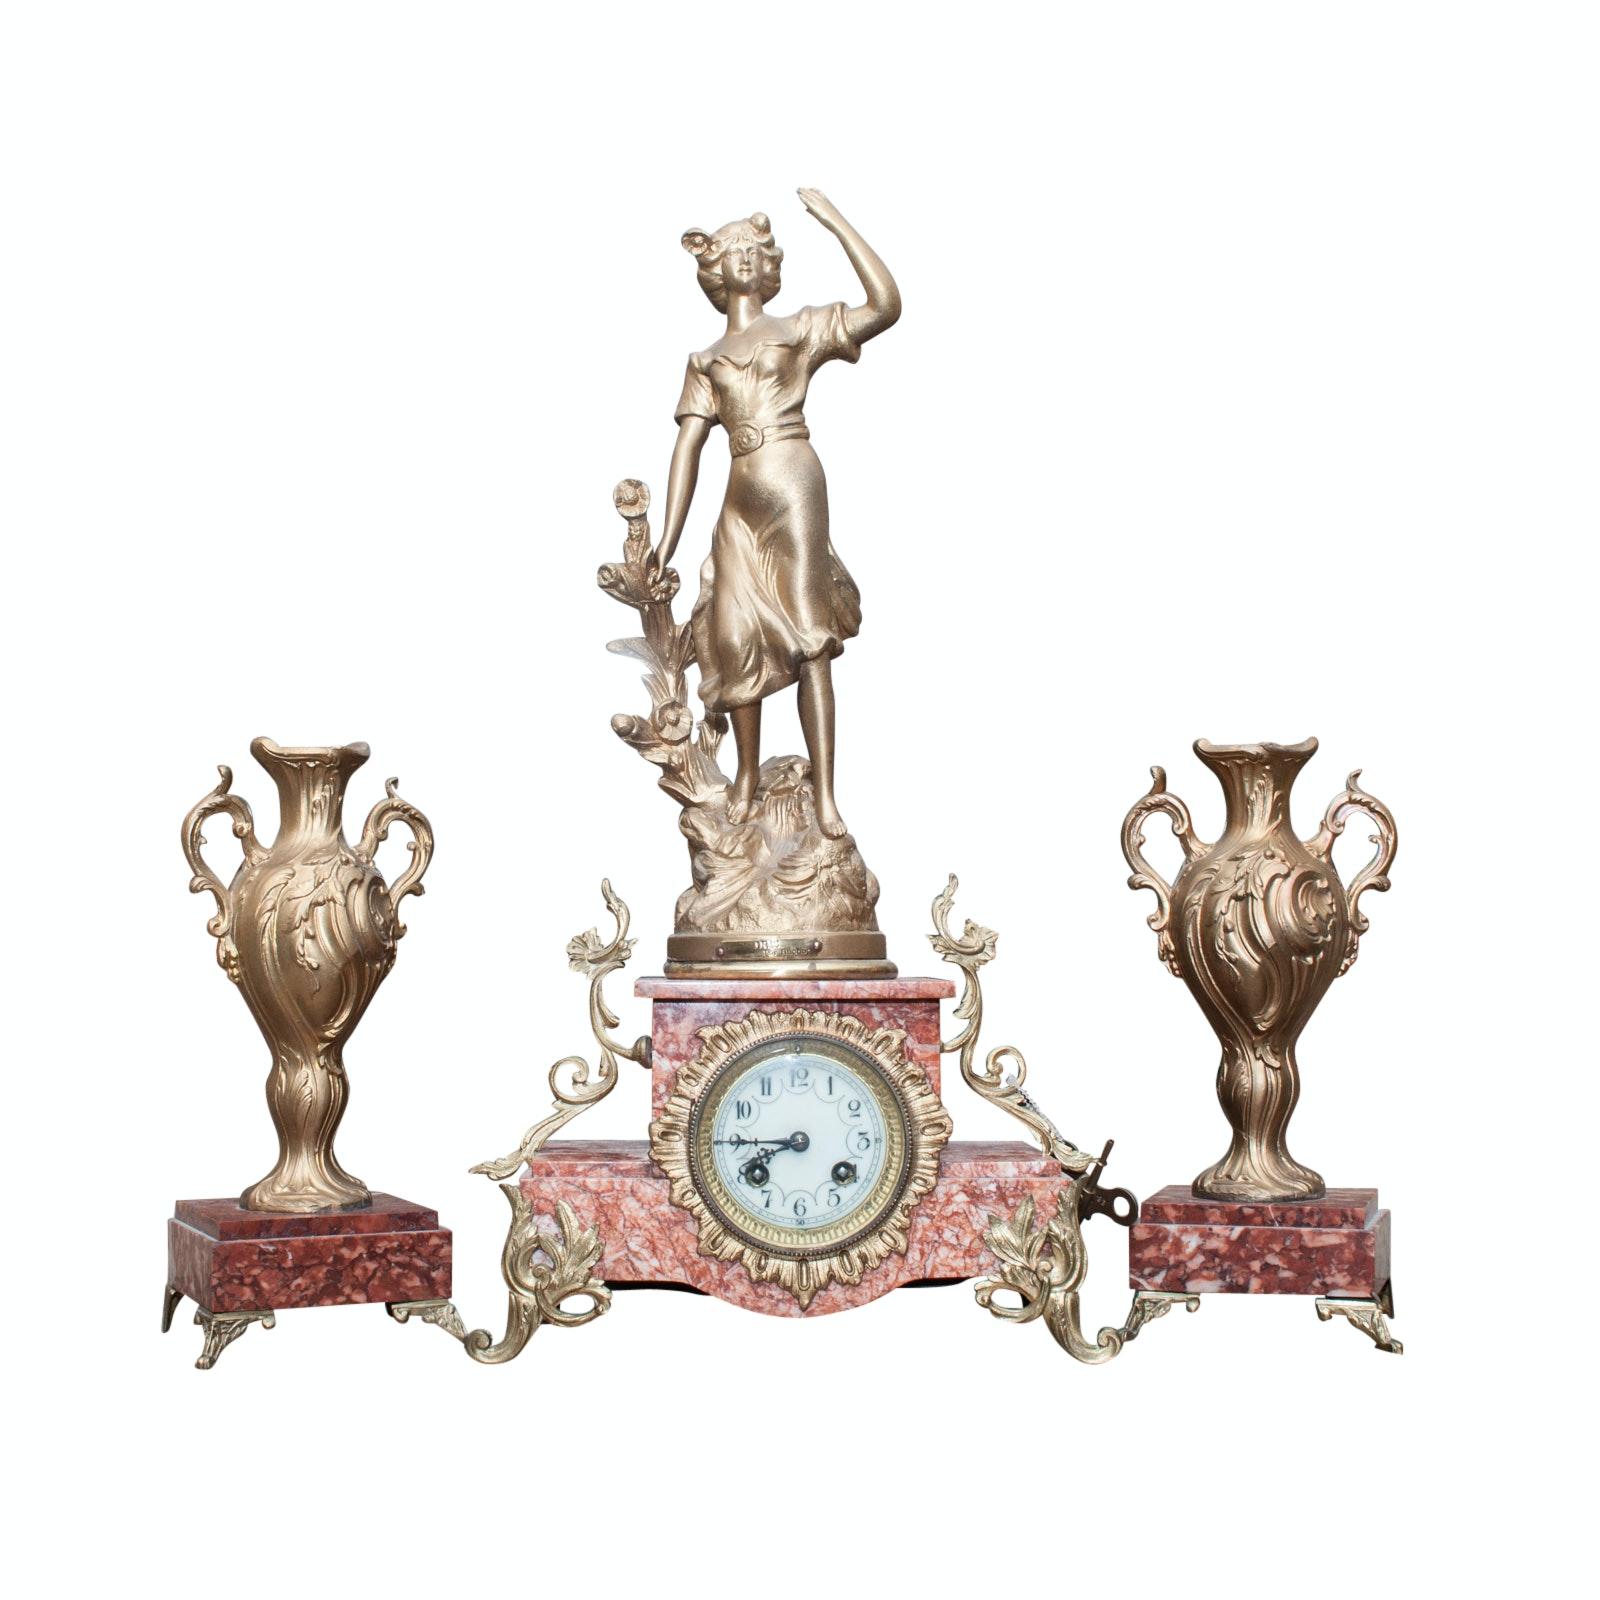 Vintage Charles Ruchot Reproduction Art Nouveau Mantel Clock with Urn Garnitures